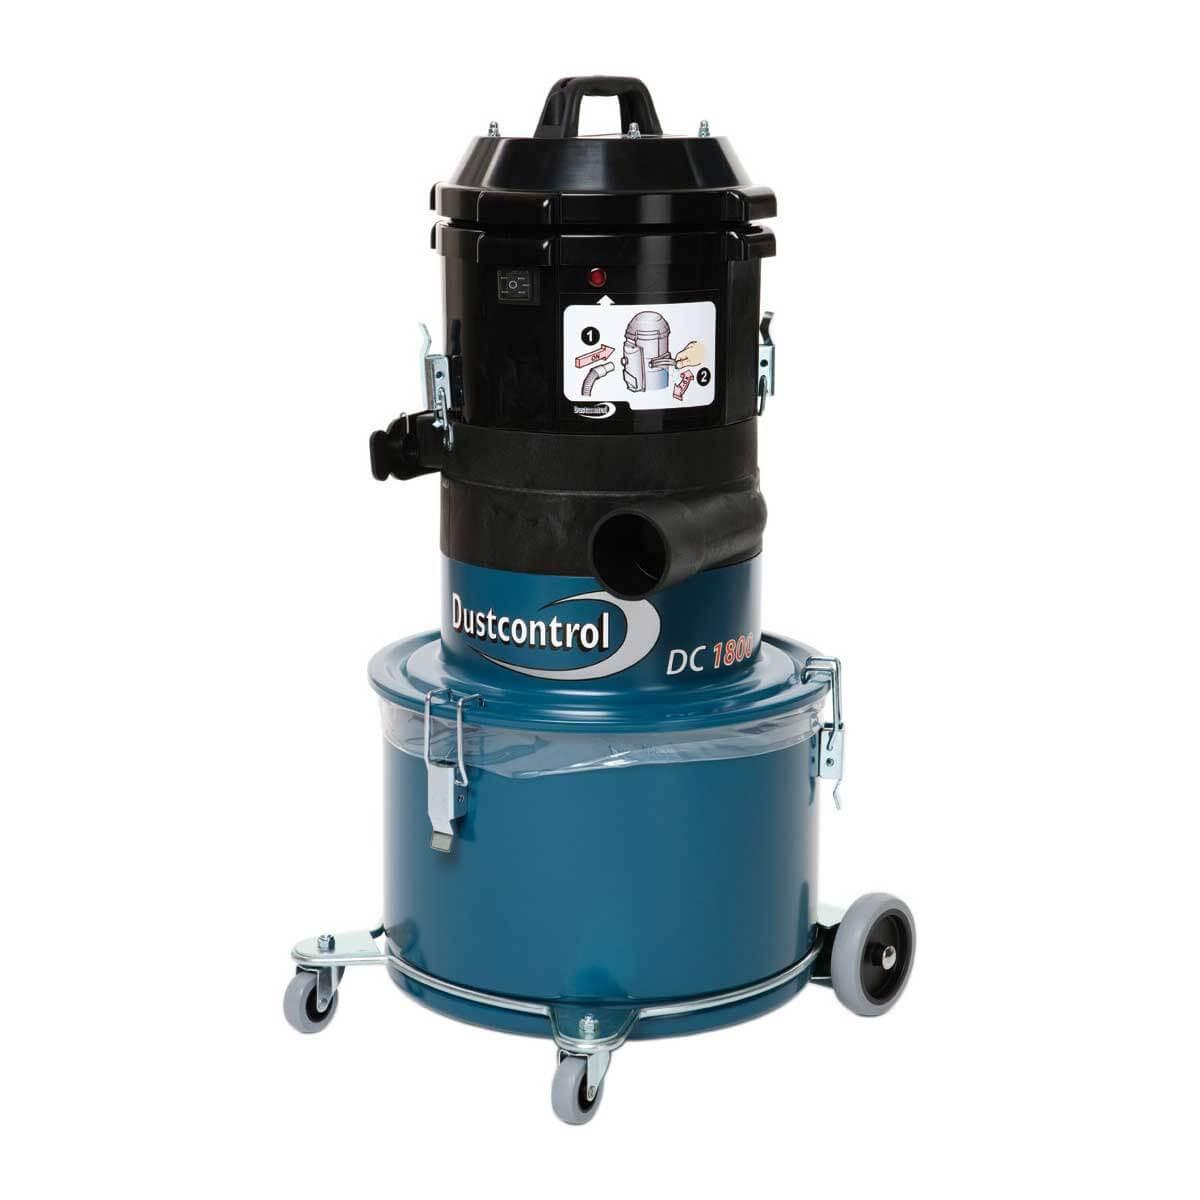 DustControl 101830 Single Phase Dust Extractors